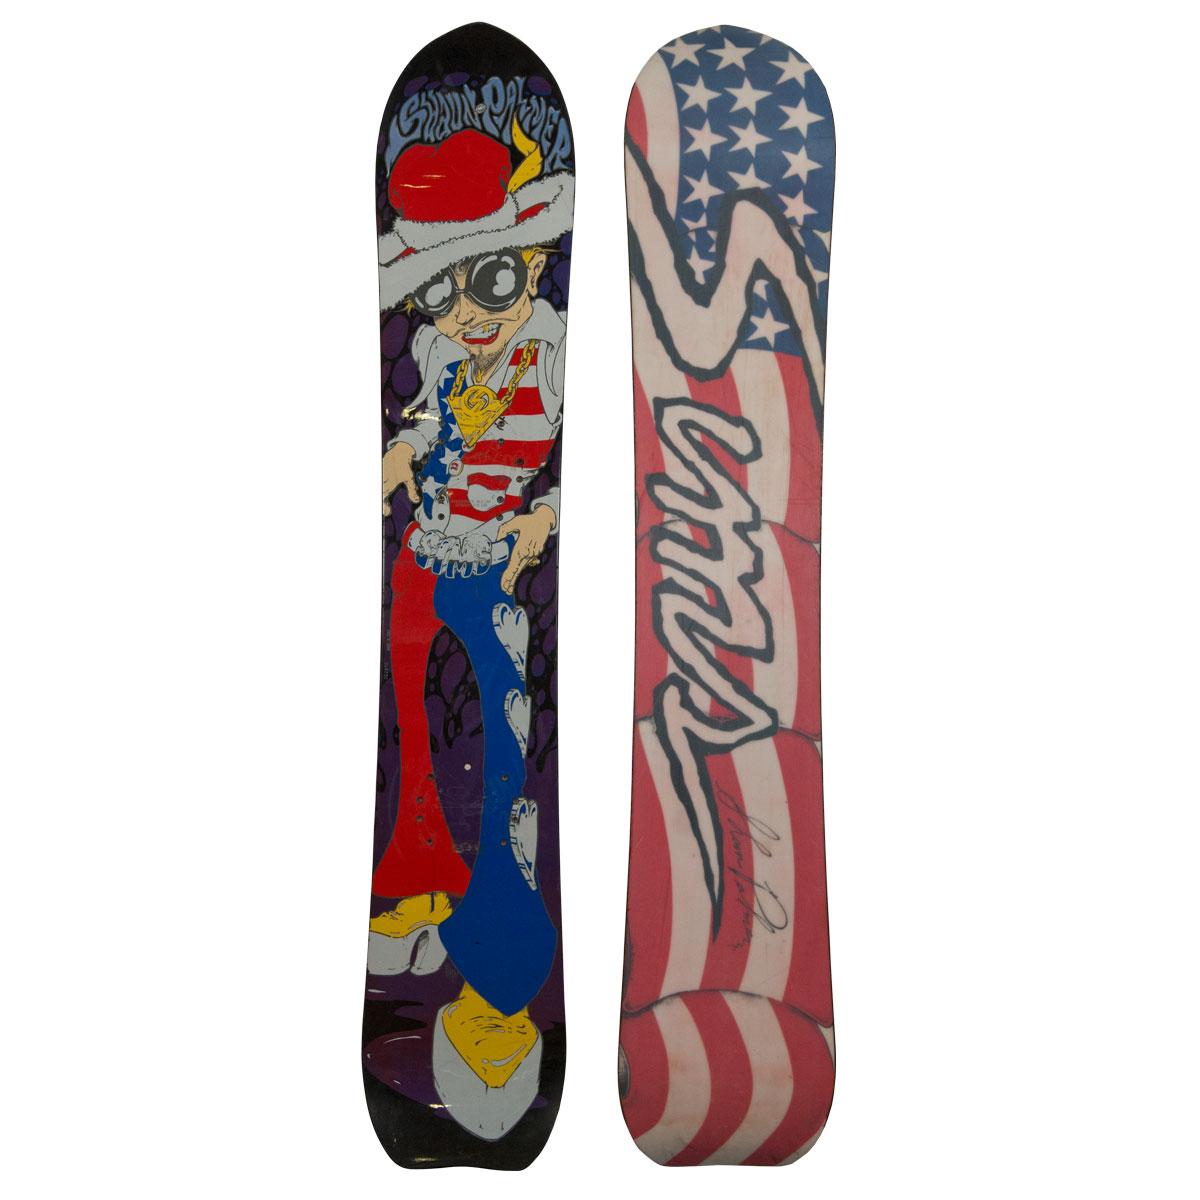 Sims Shawn Palmer Pimp Vintage Snowboard